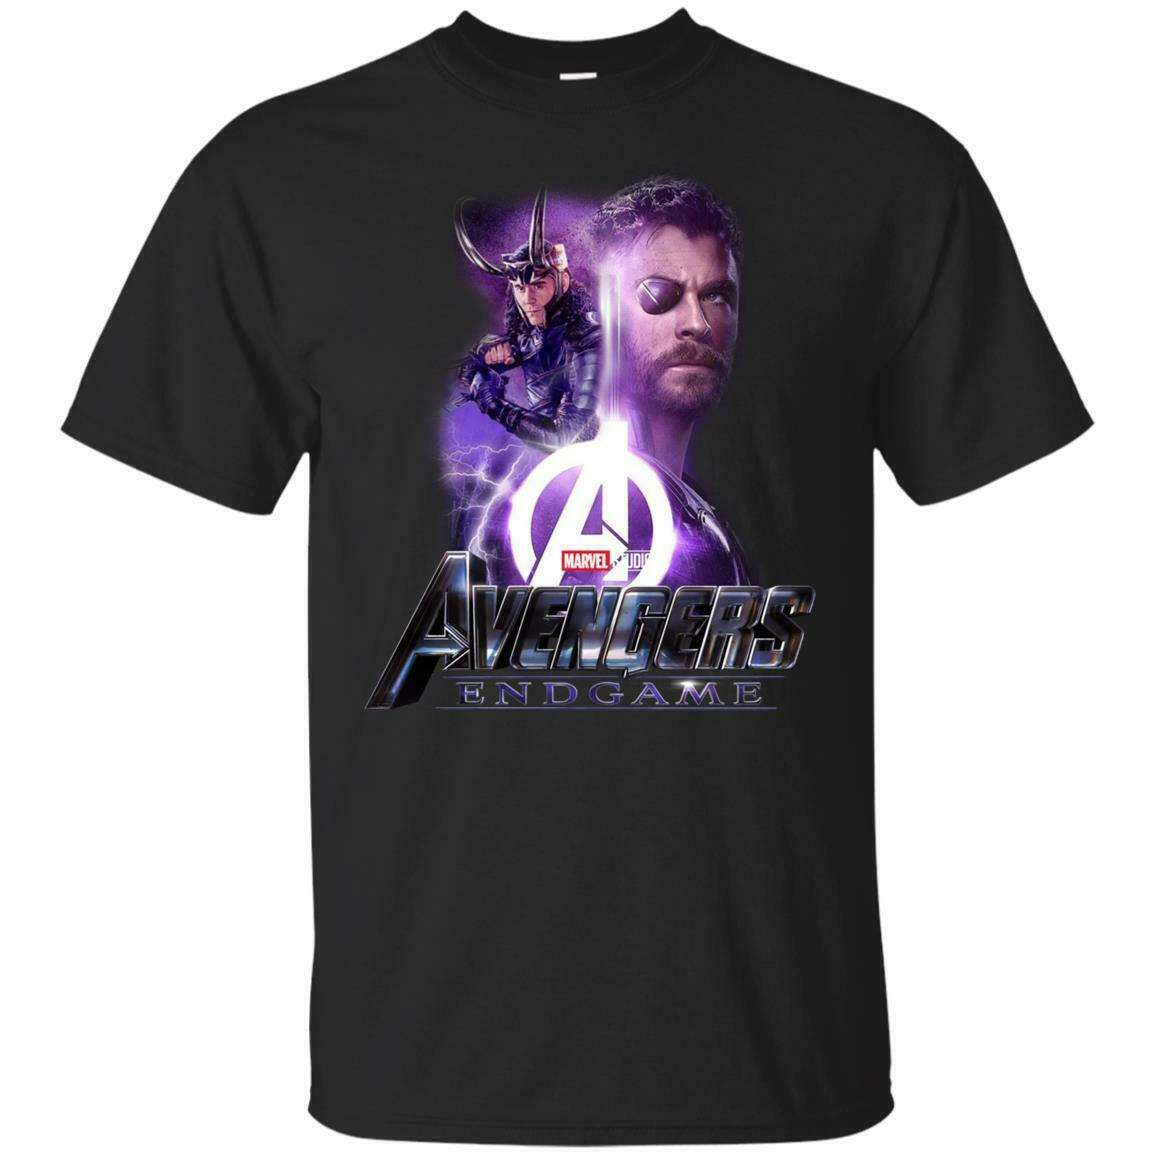 Thor y loki-vengadores final Marvel afiche cómico camiseta negra para hombres de manga corta de algodón camiseta moda camiseta superior